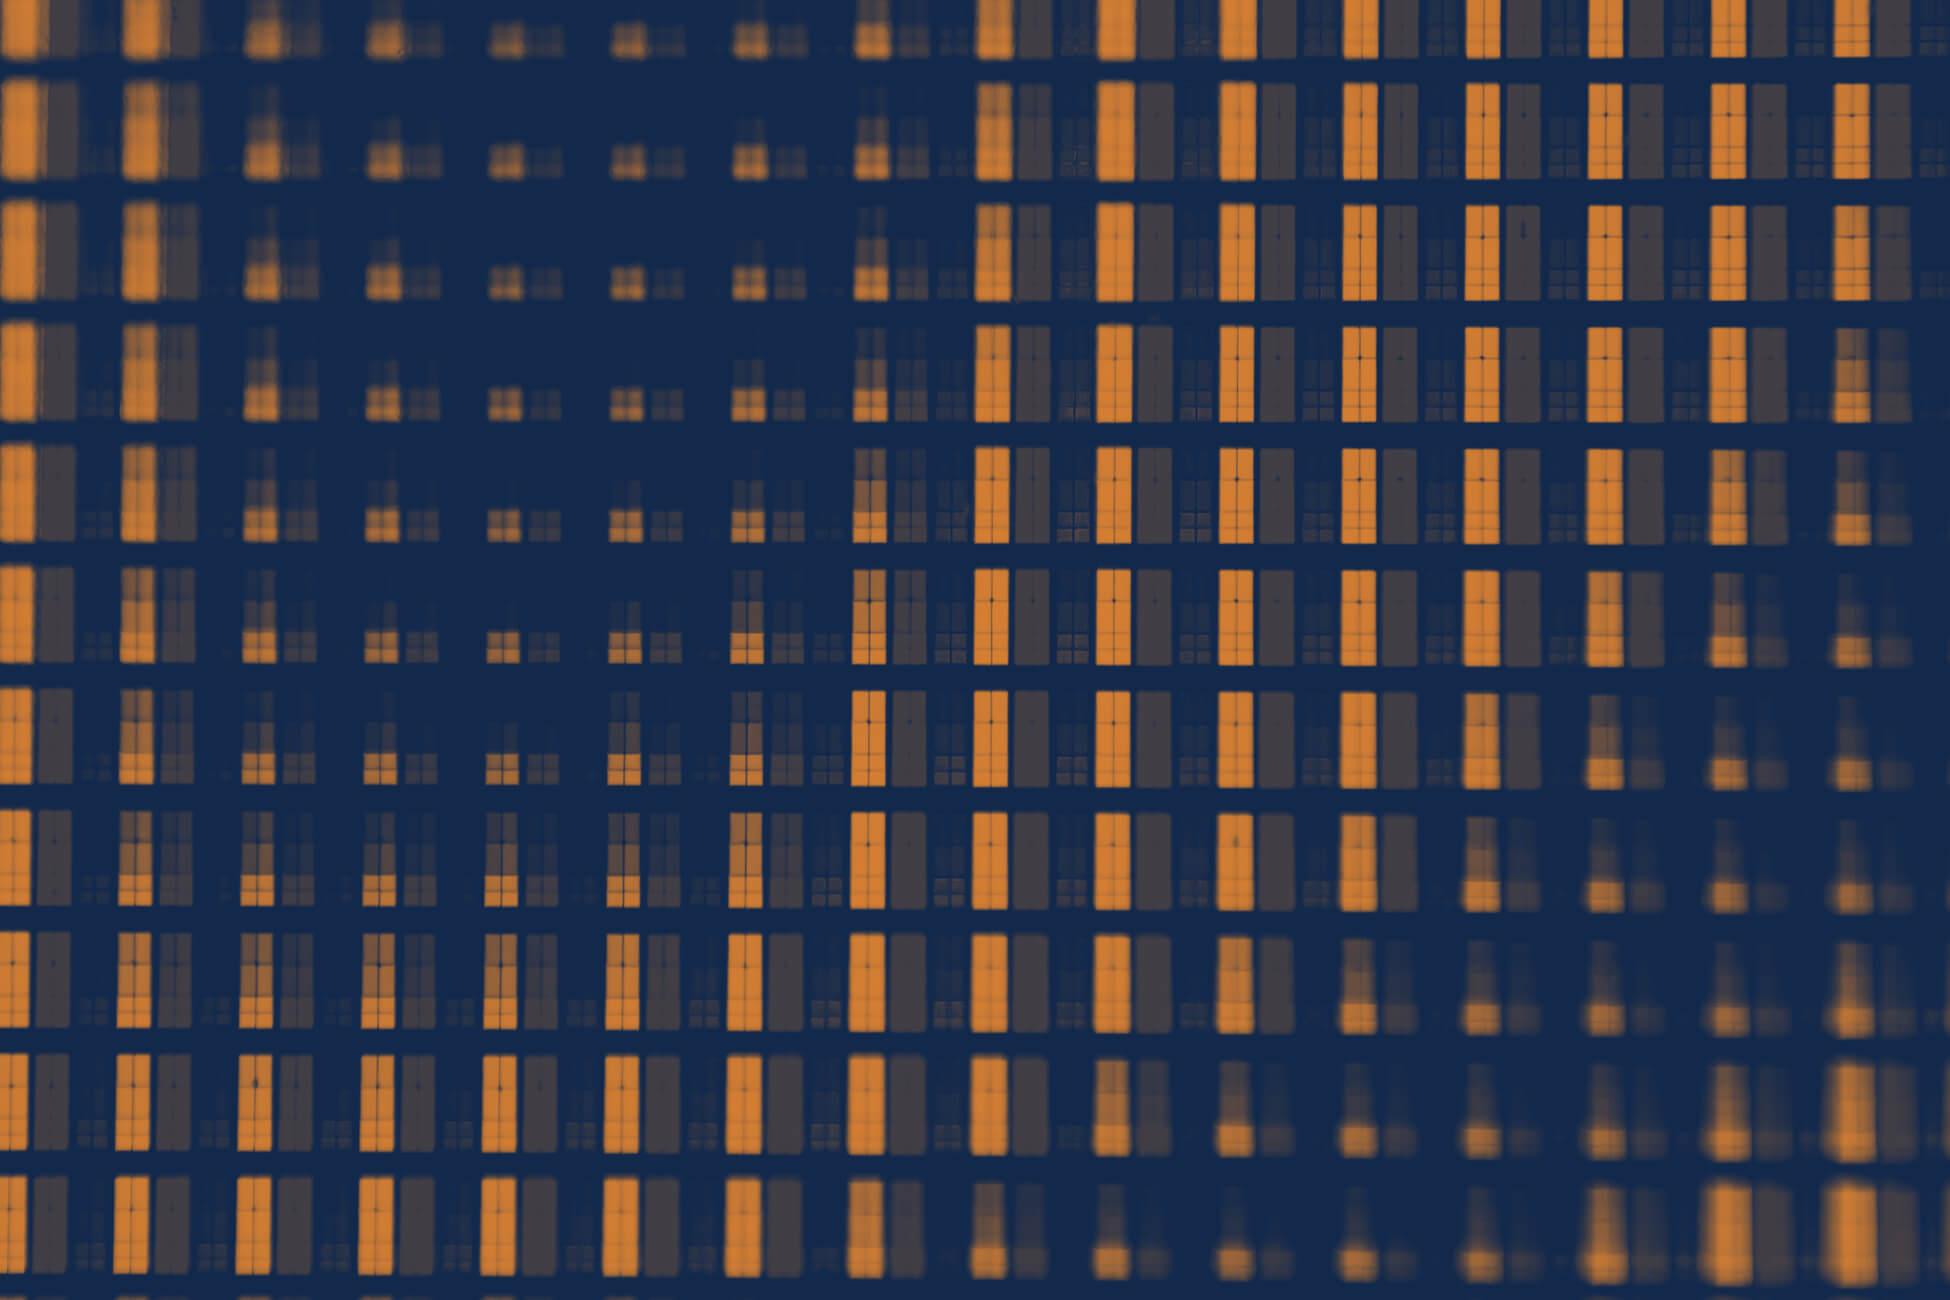 Zoomed in TV screen pixels